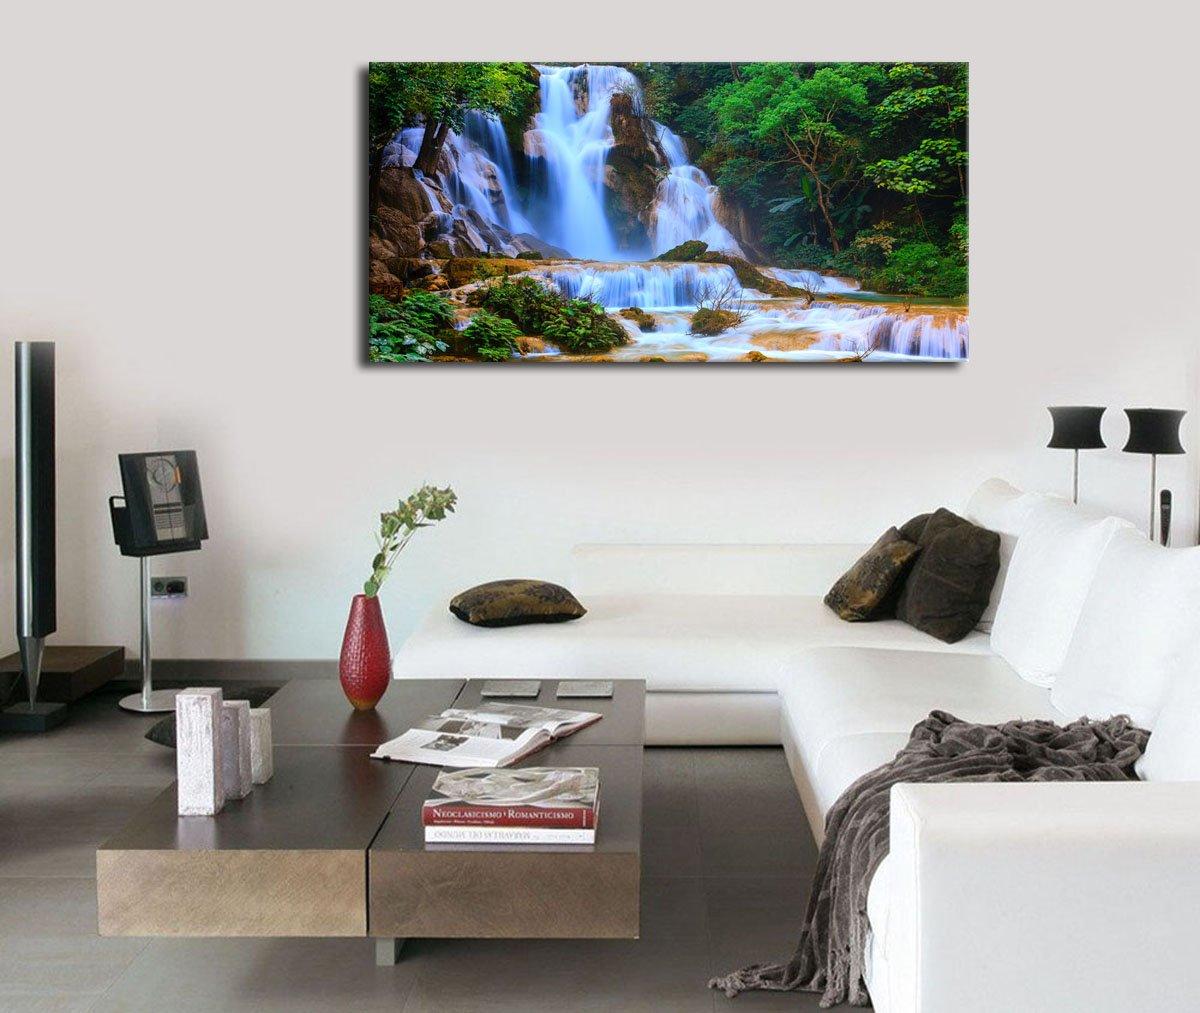 Amazon.com: Canvas Wall Art Waterfall Mountain Lake Nature Painting ...